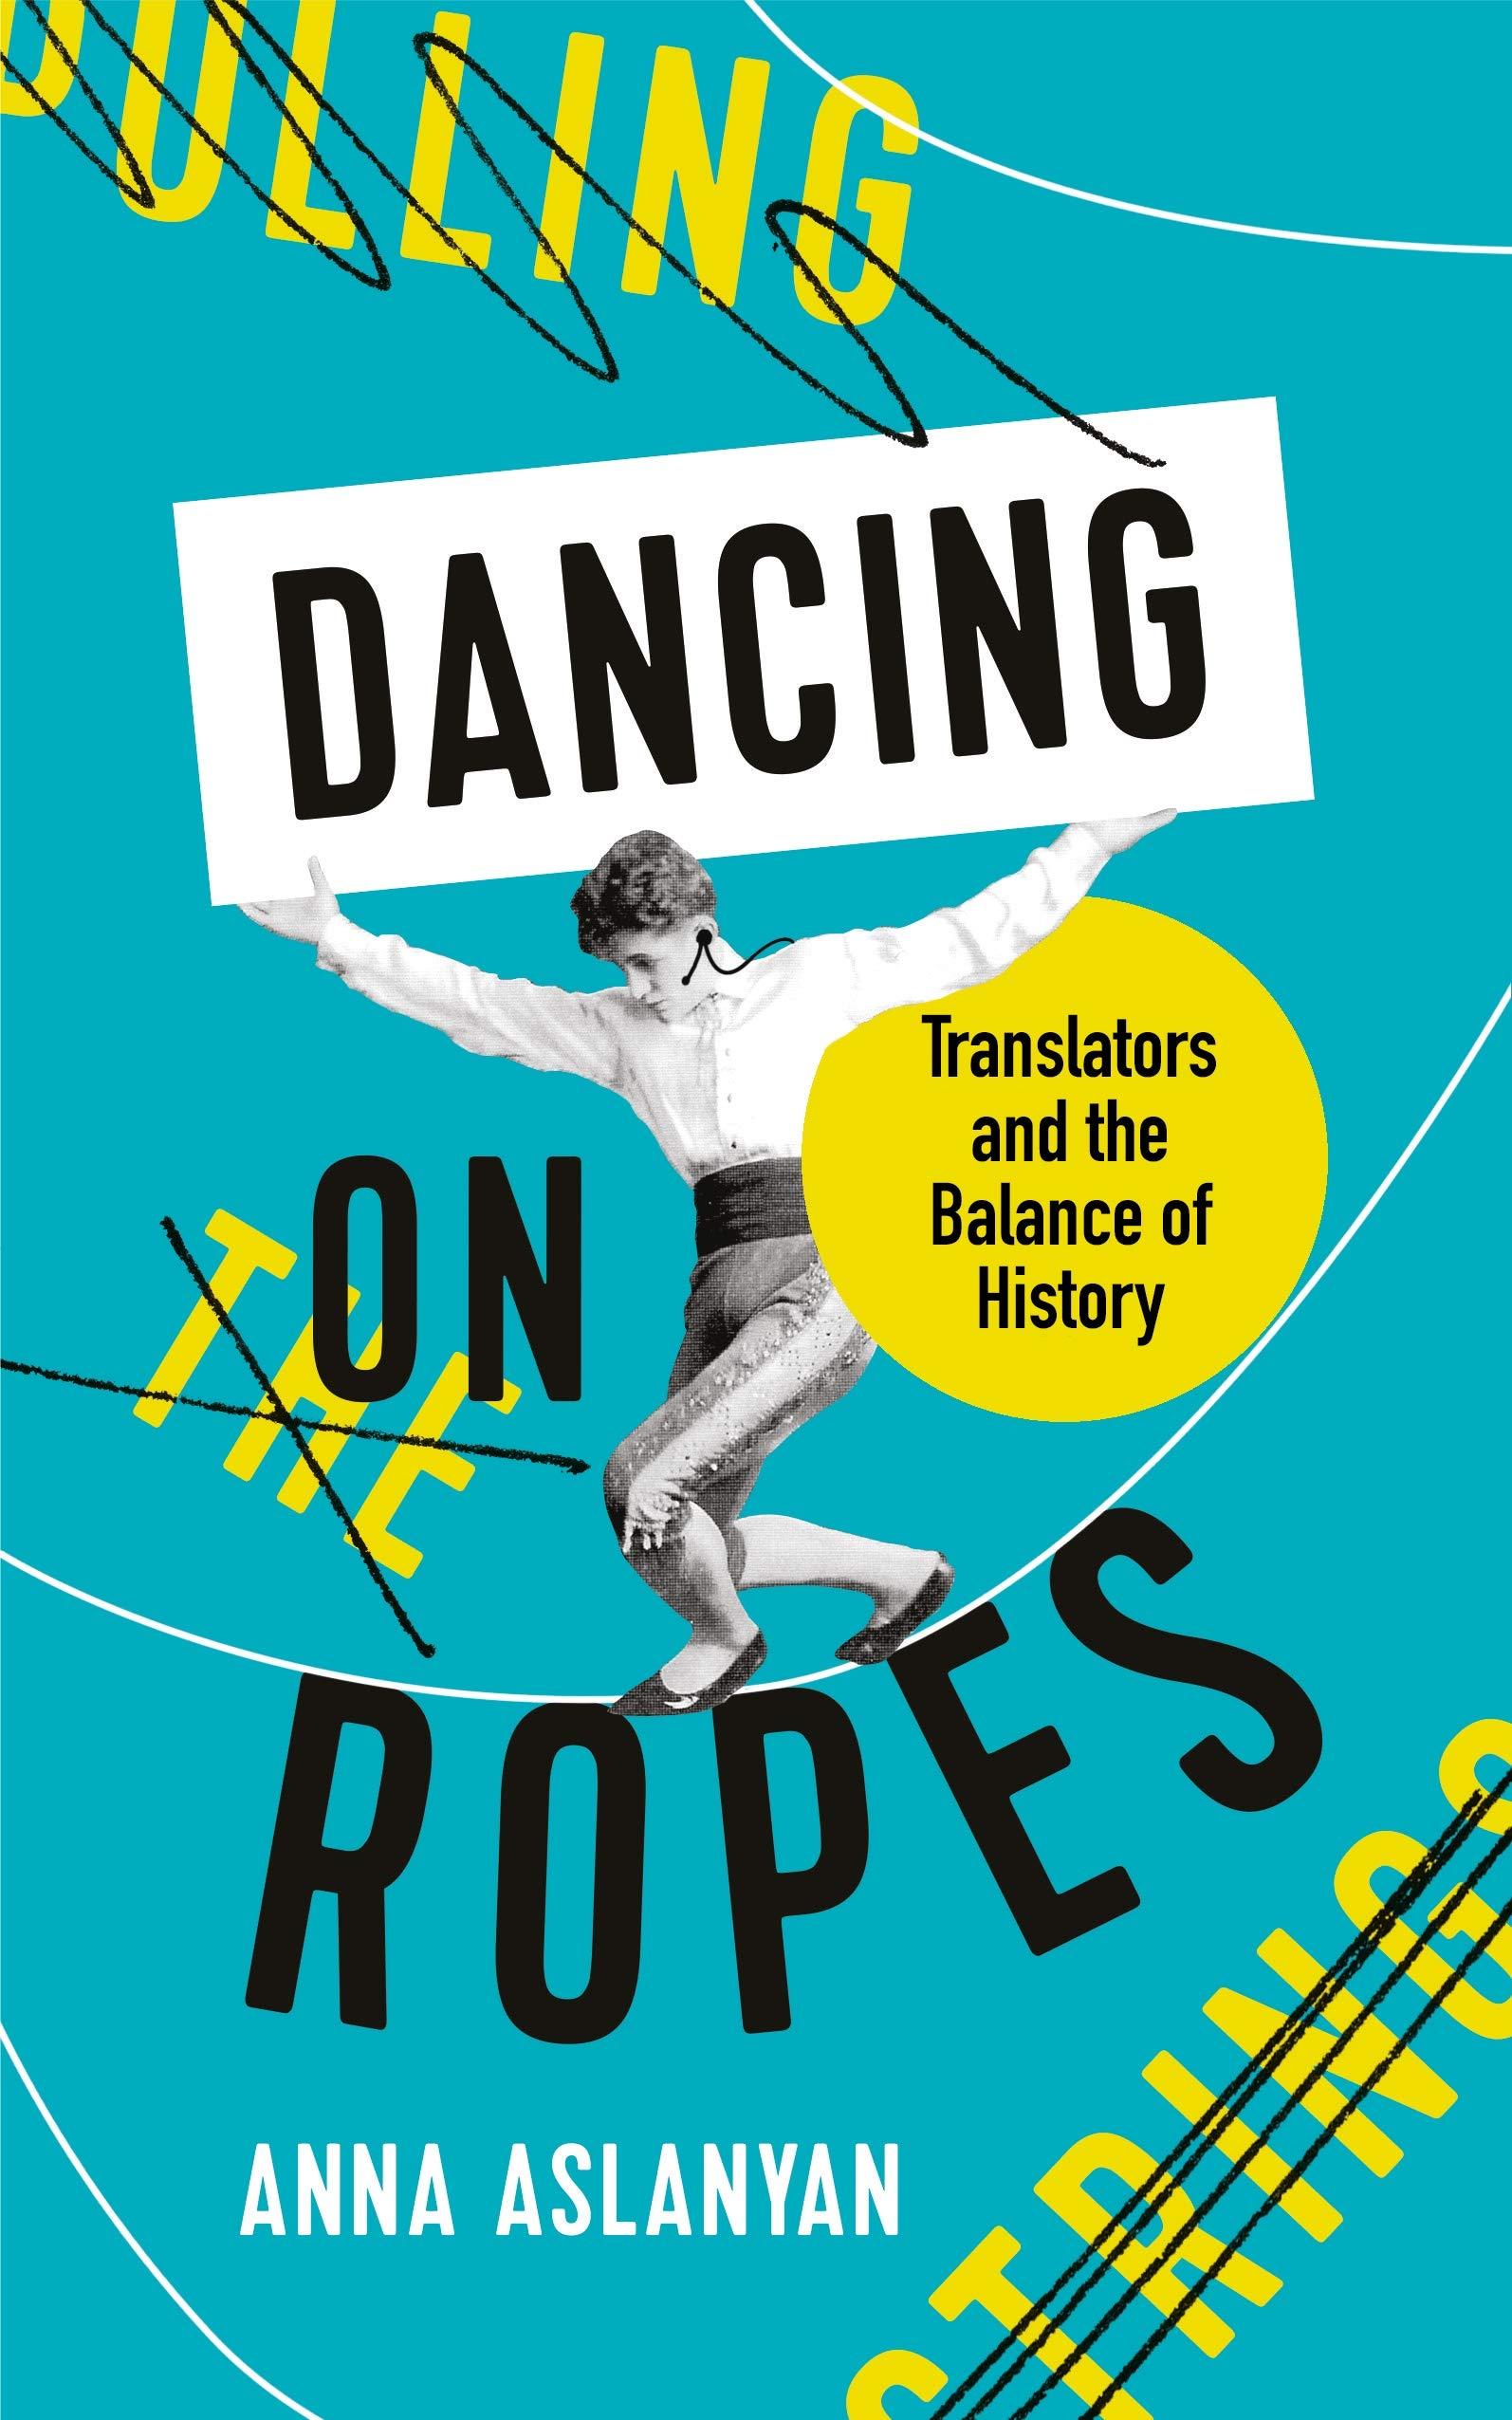 Dancing On Ropes: Aslanyan, Anna: 9781788162630: Amazon.com: Books